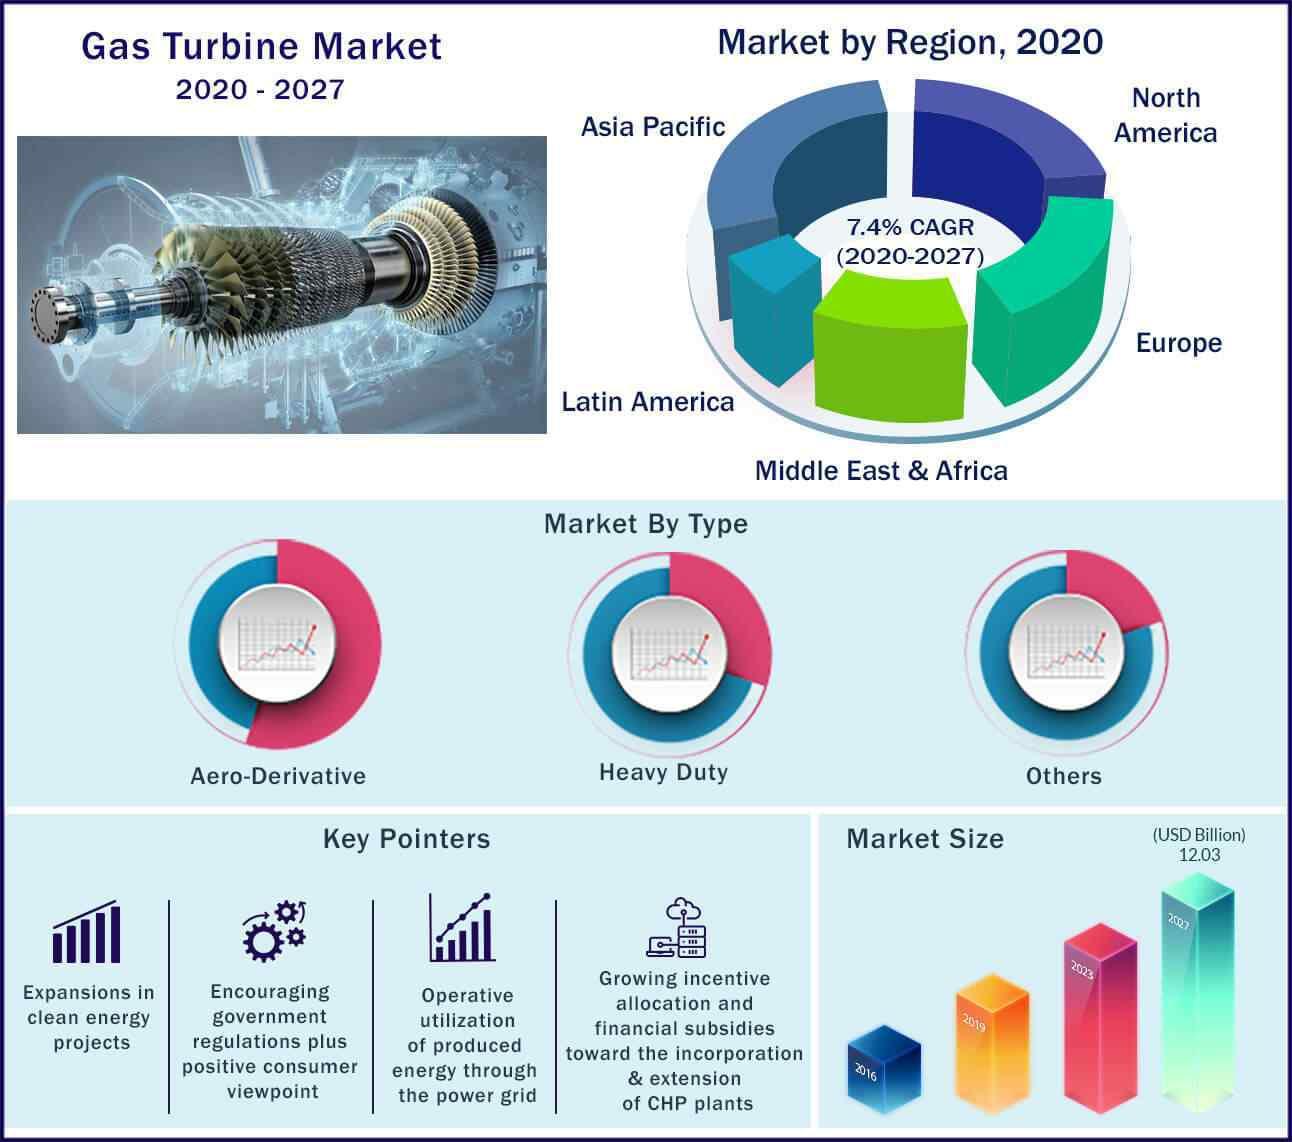 Global Gas Turbine Market 2020-2027